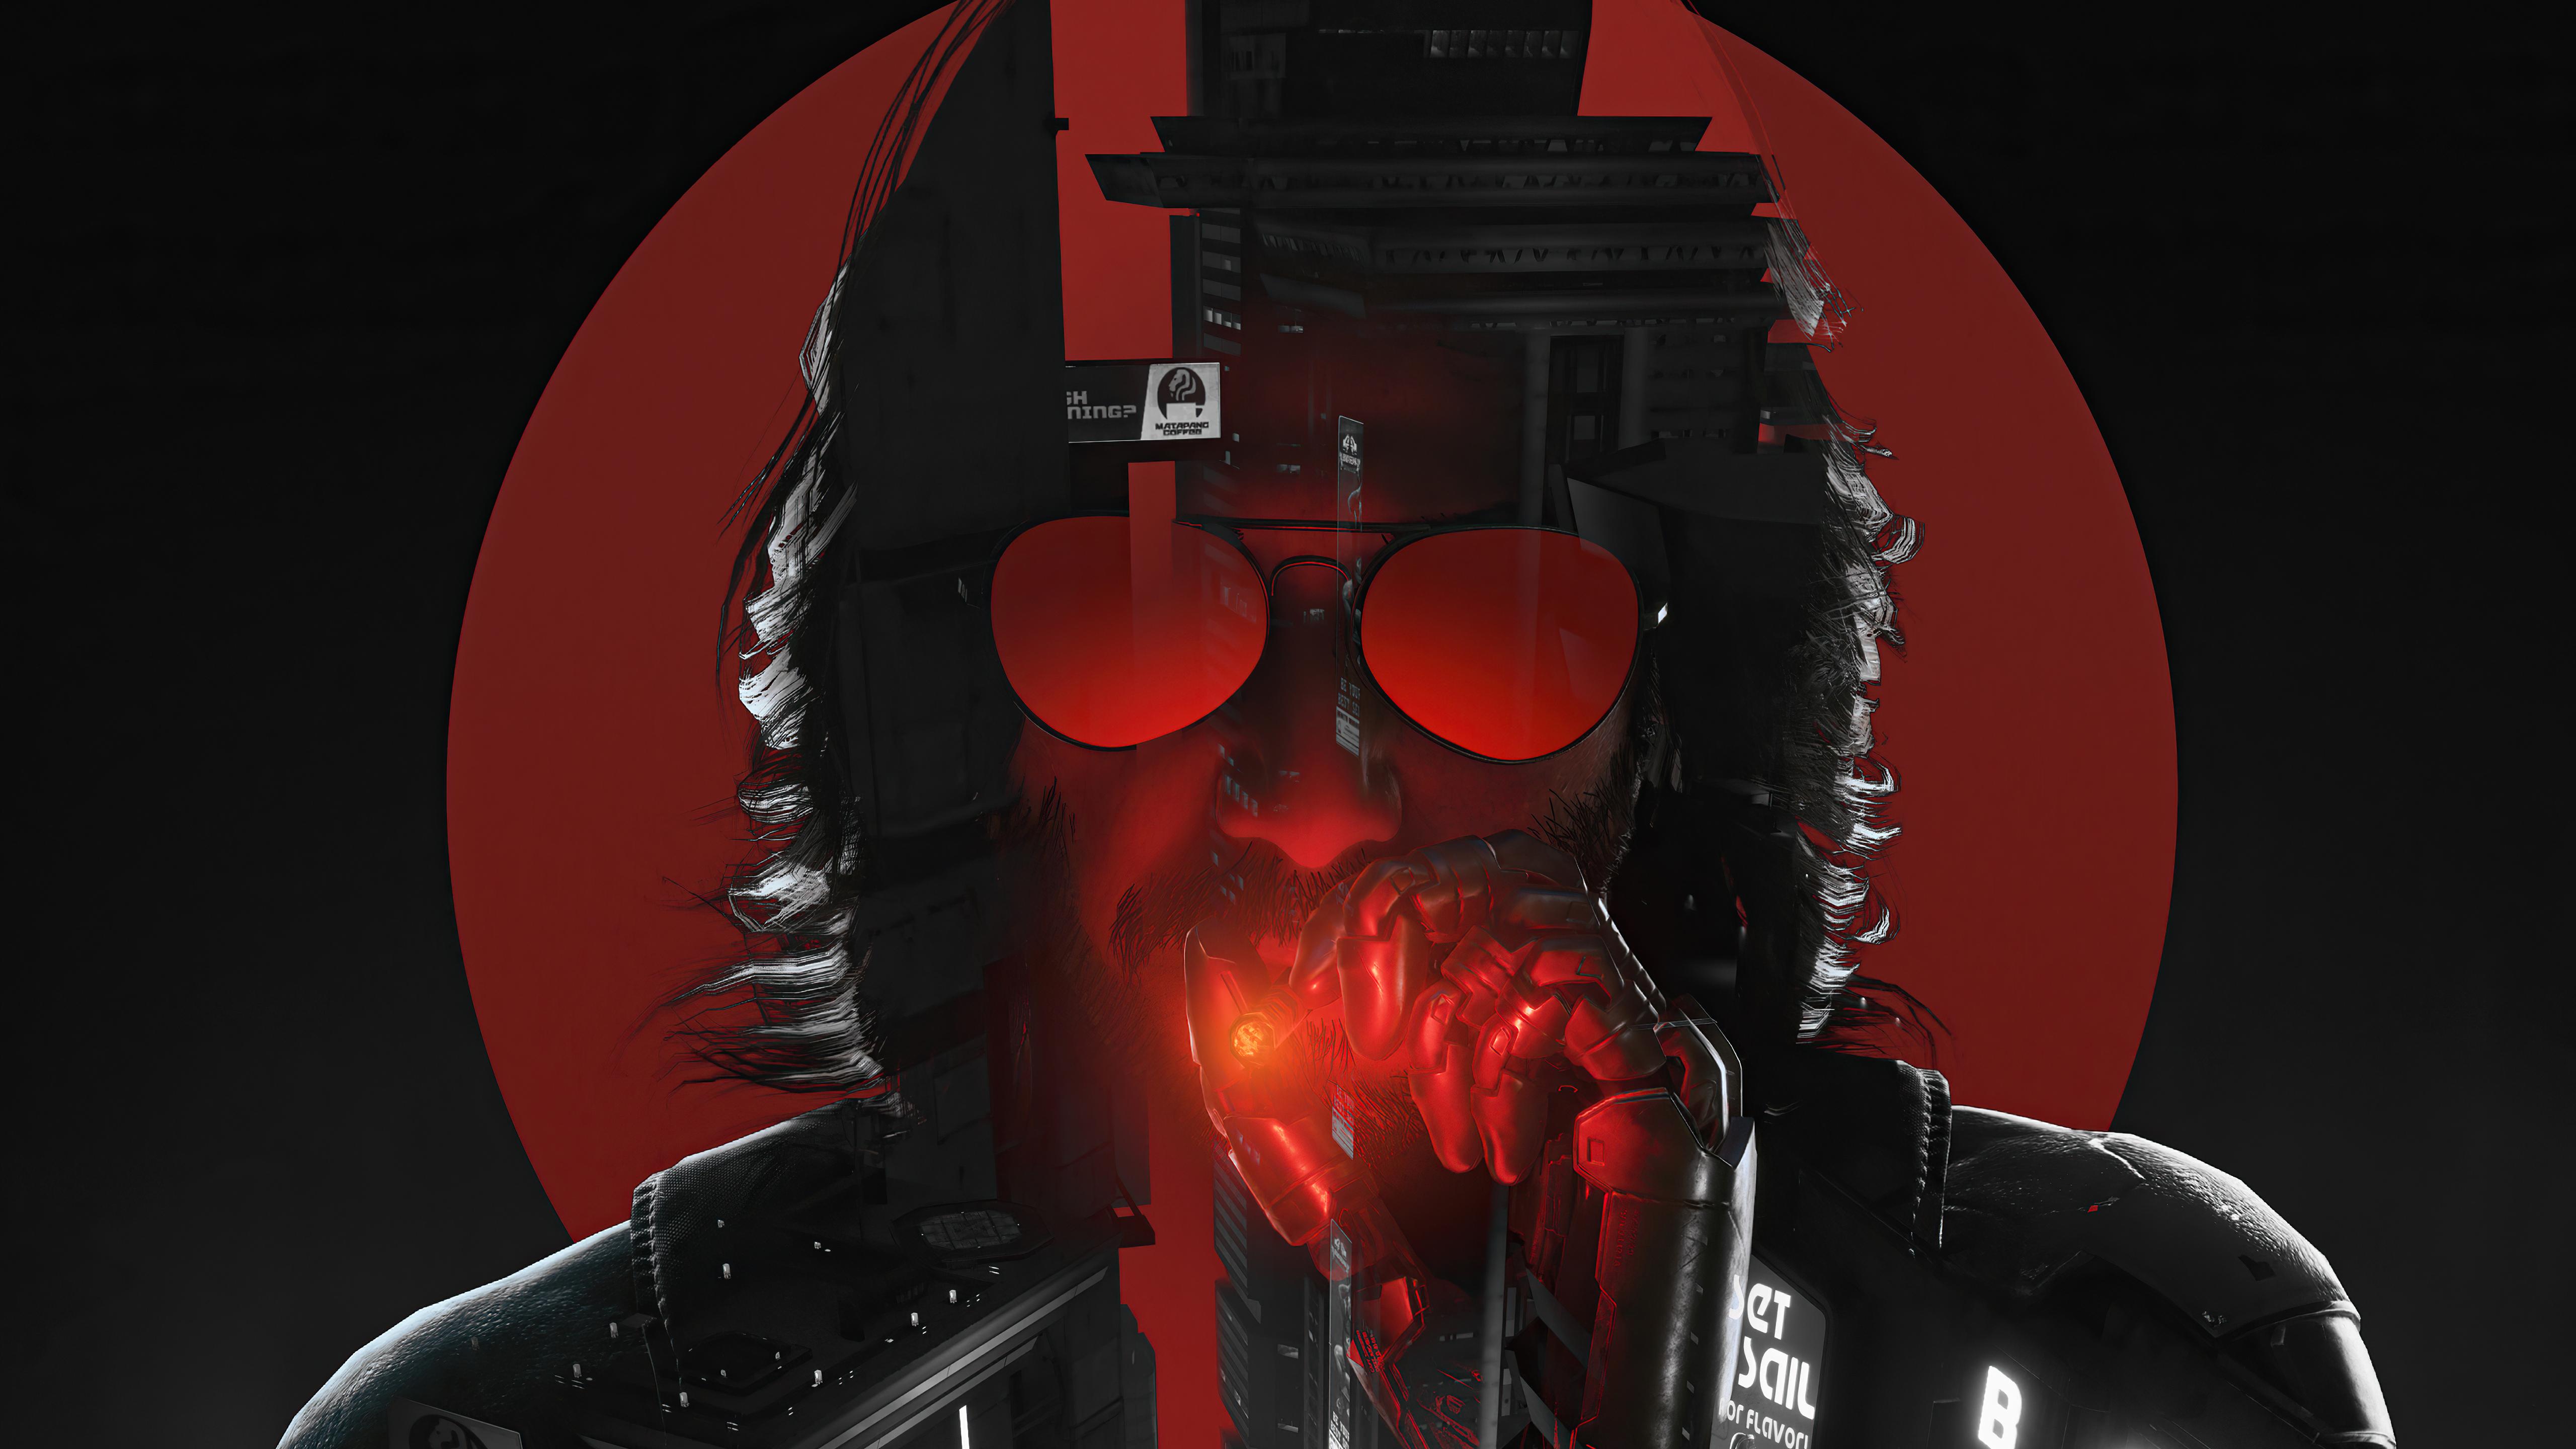 rockerboy johnny cyberpunk 2077 4k 1615132298 - Rockerboy Johnny Cyberpunk 2077 4k - Rockerboy Johnny Cyberpunk 2077 4k wallpapers